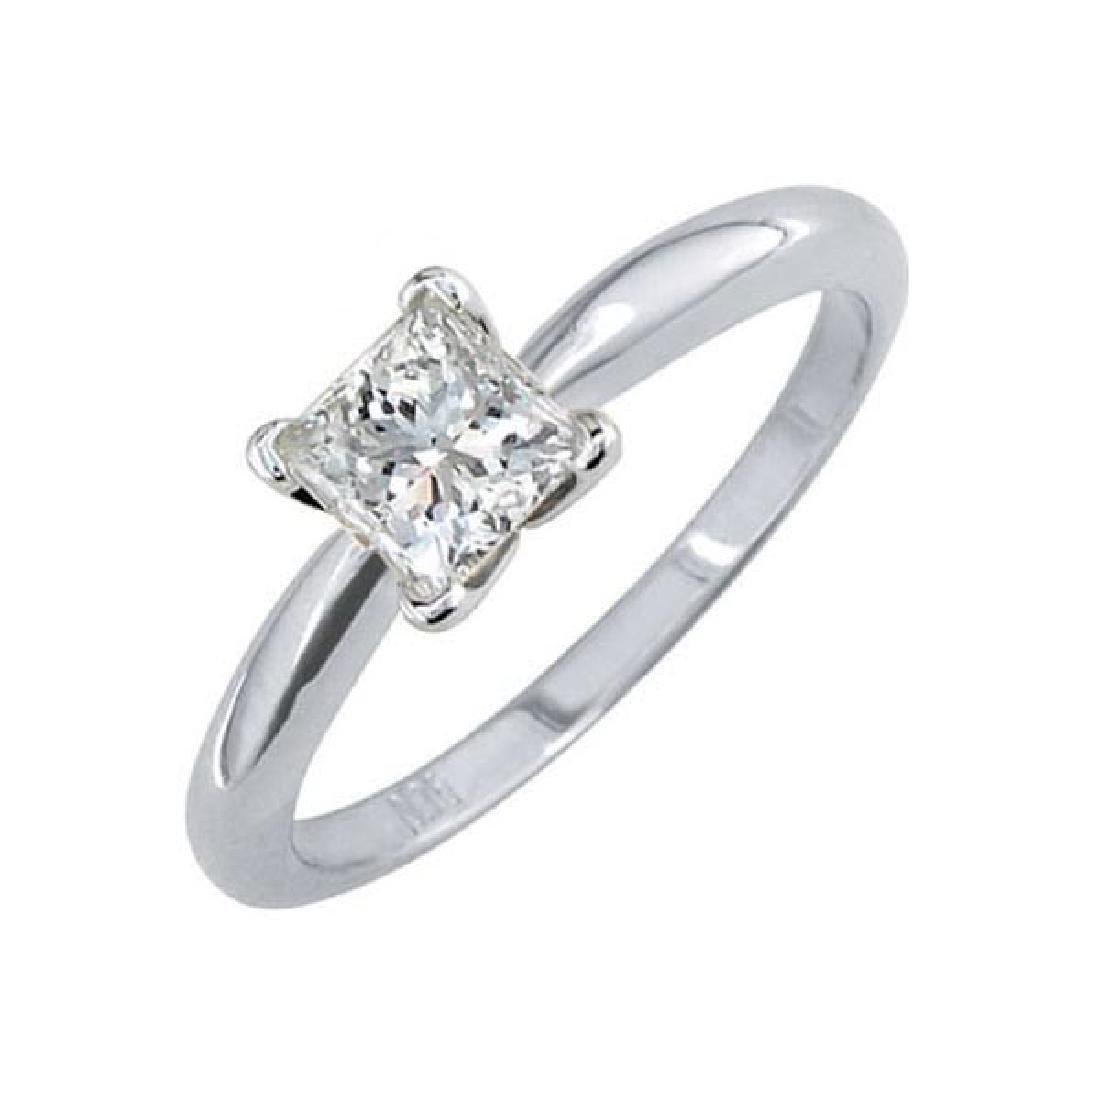 Certified 1.02 CTW Princess Diamond Solitaire 14k Ring